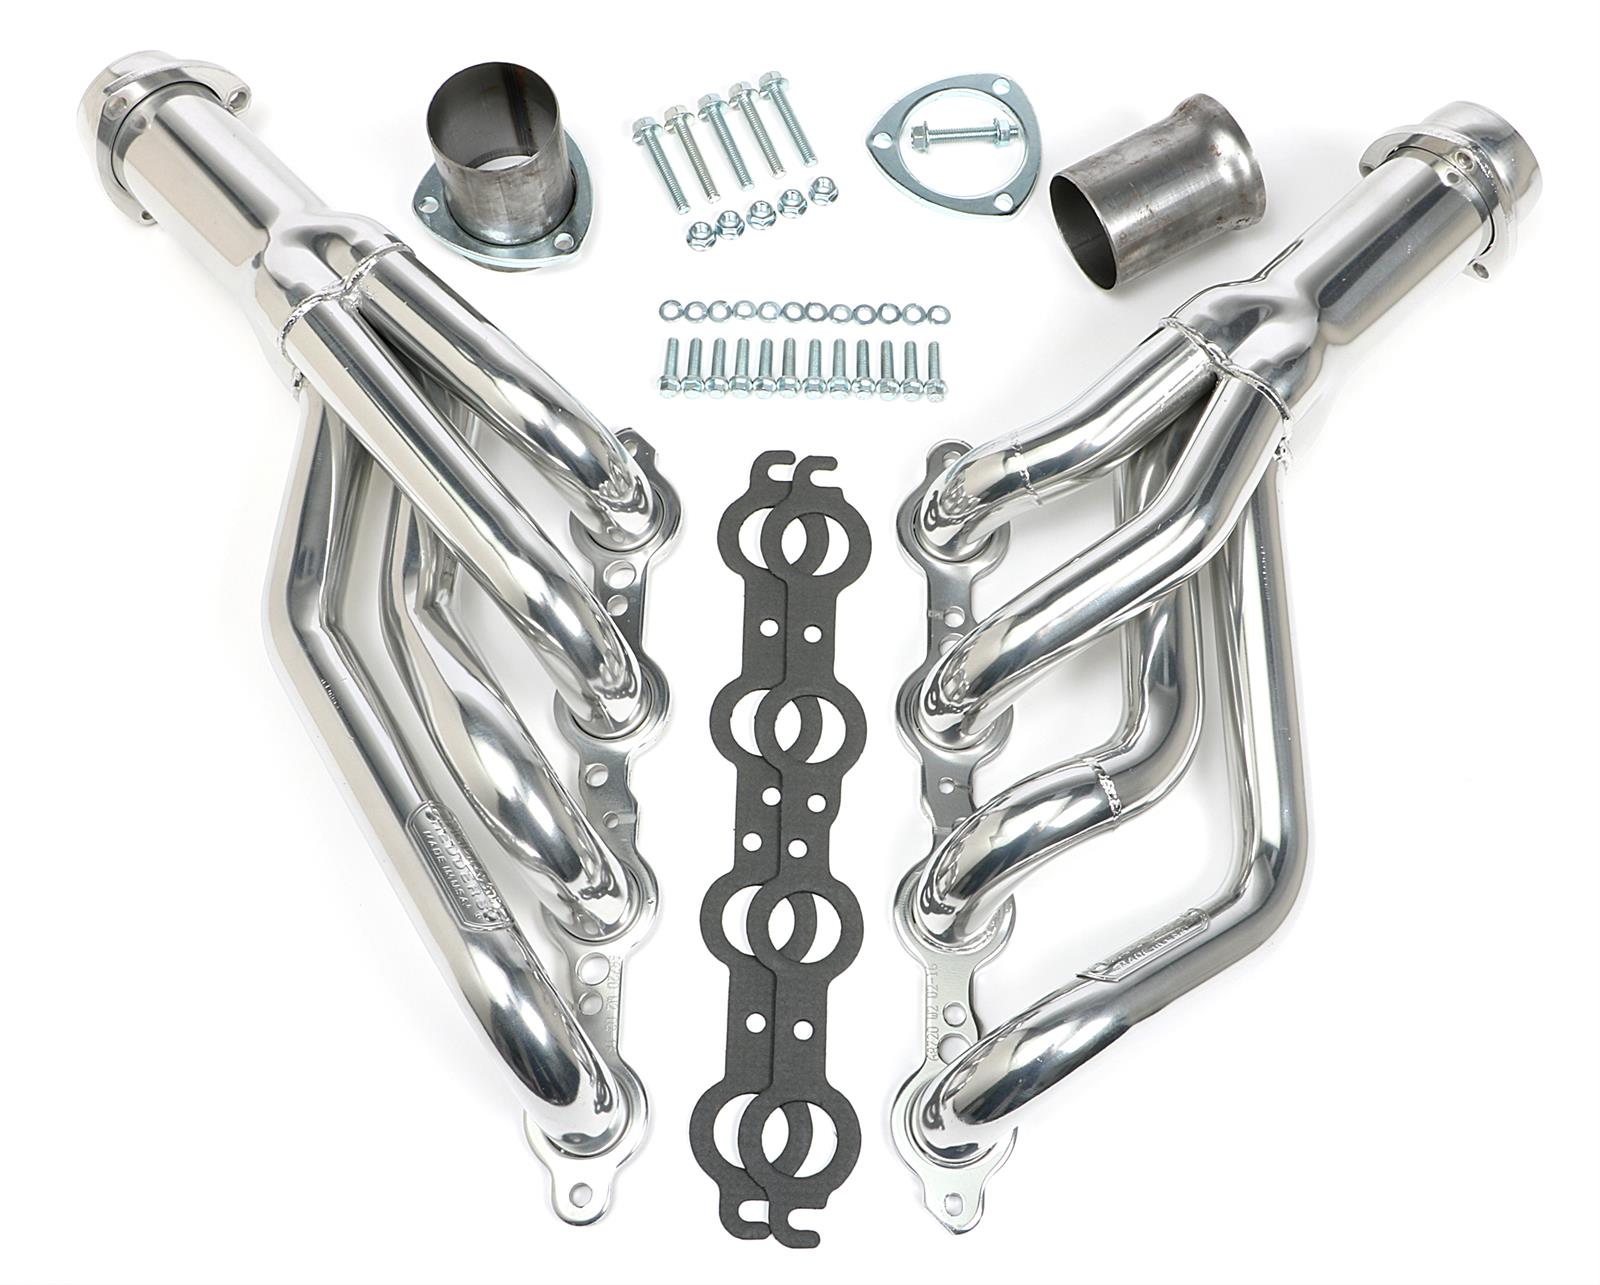 Hedman Ls Engine Swap Headers